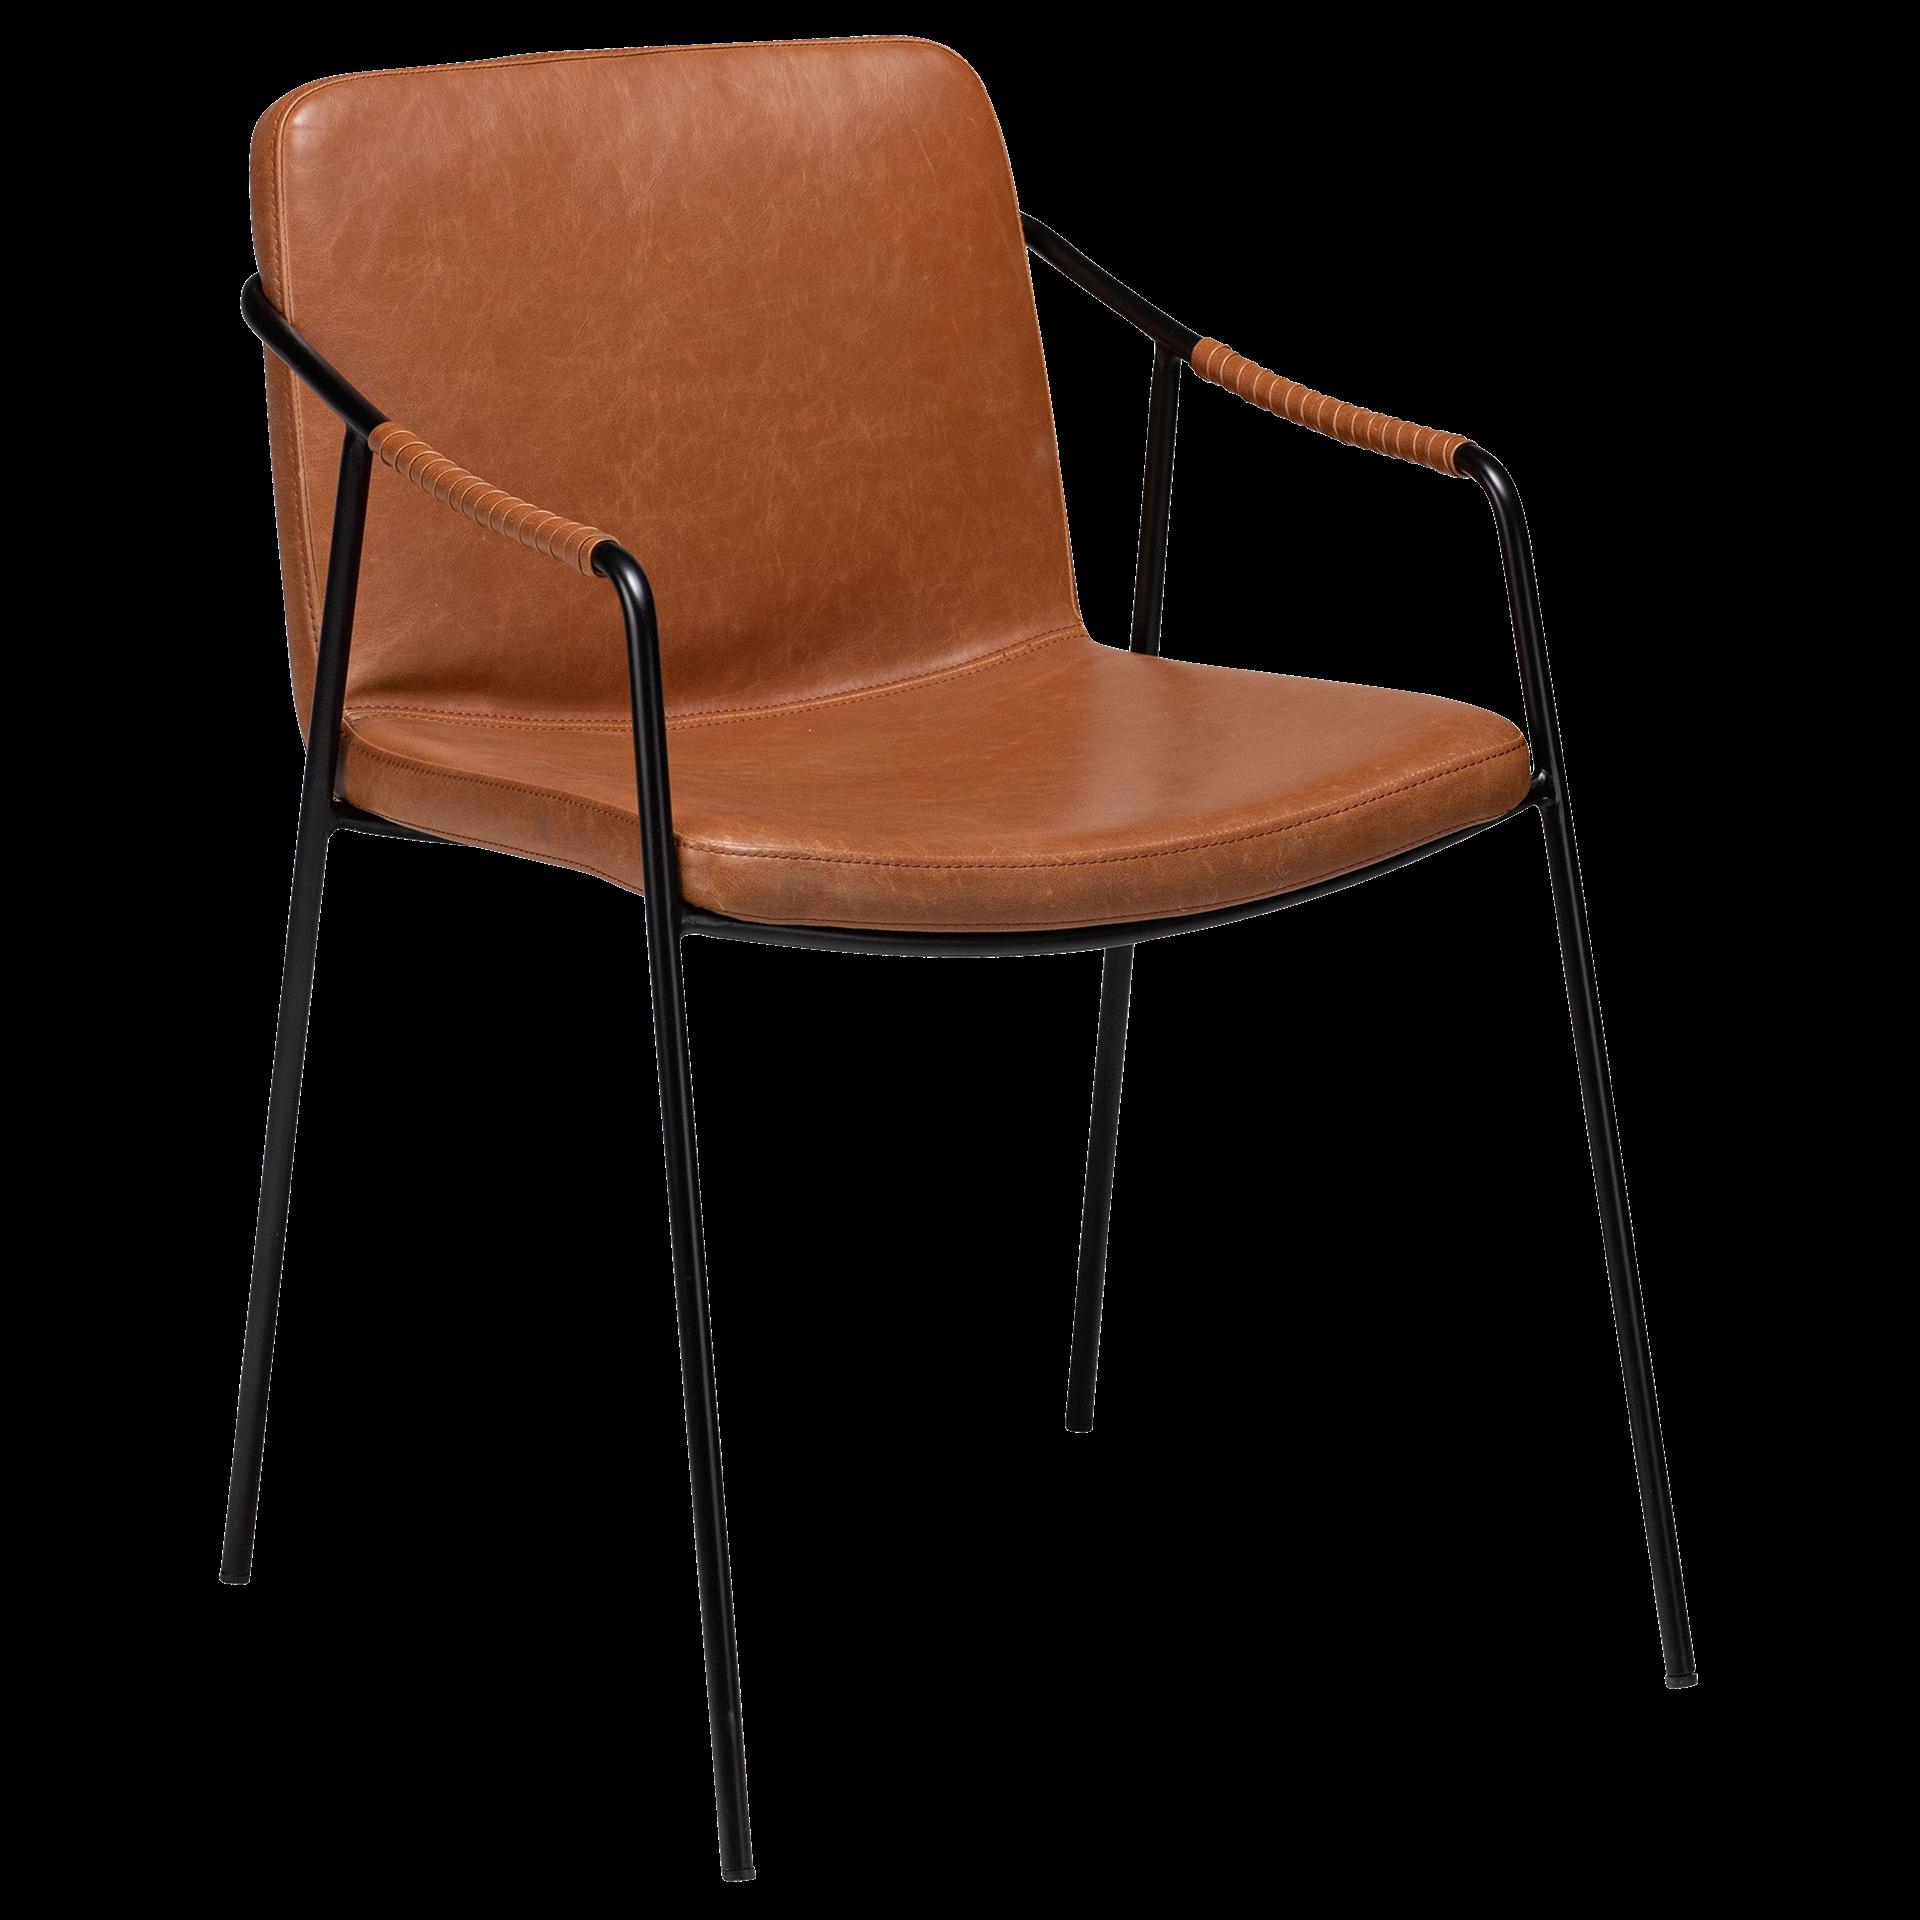 Danish Design Chairs and Armchairs | Scandinavian Chair Design